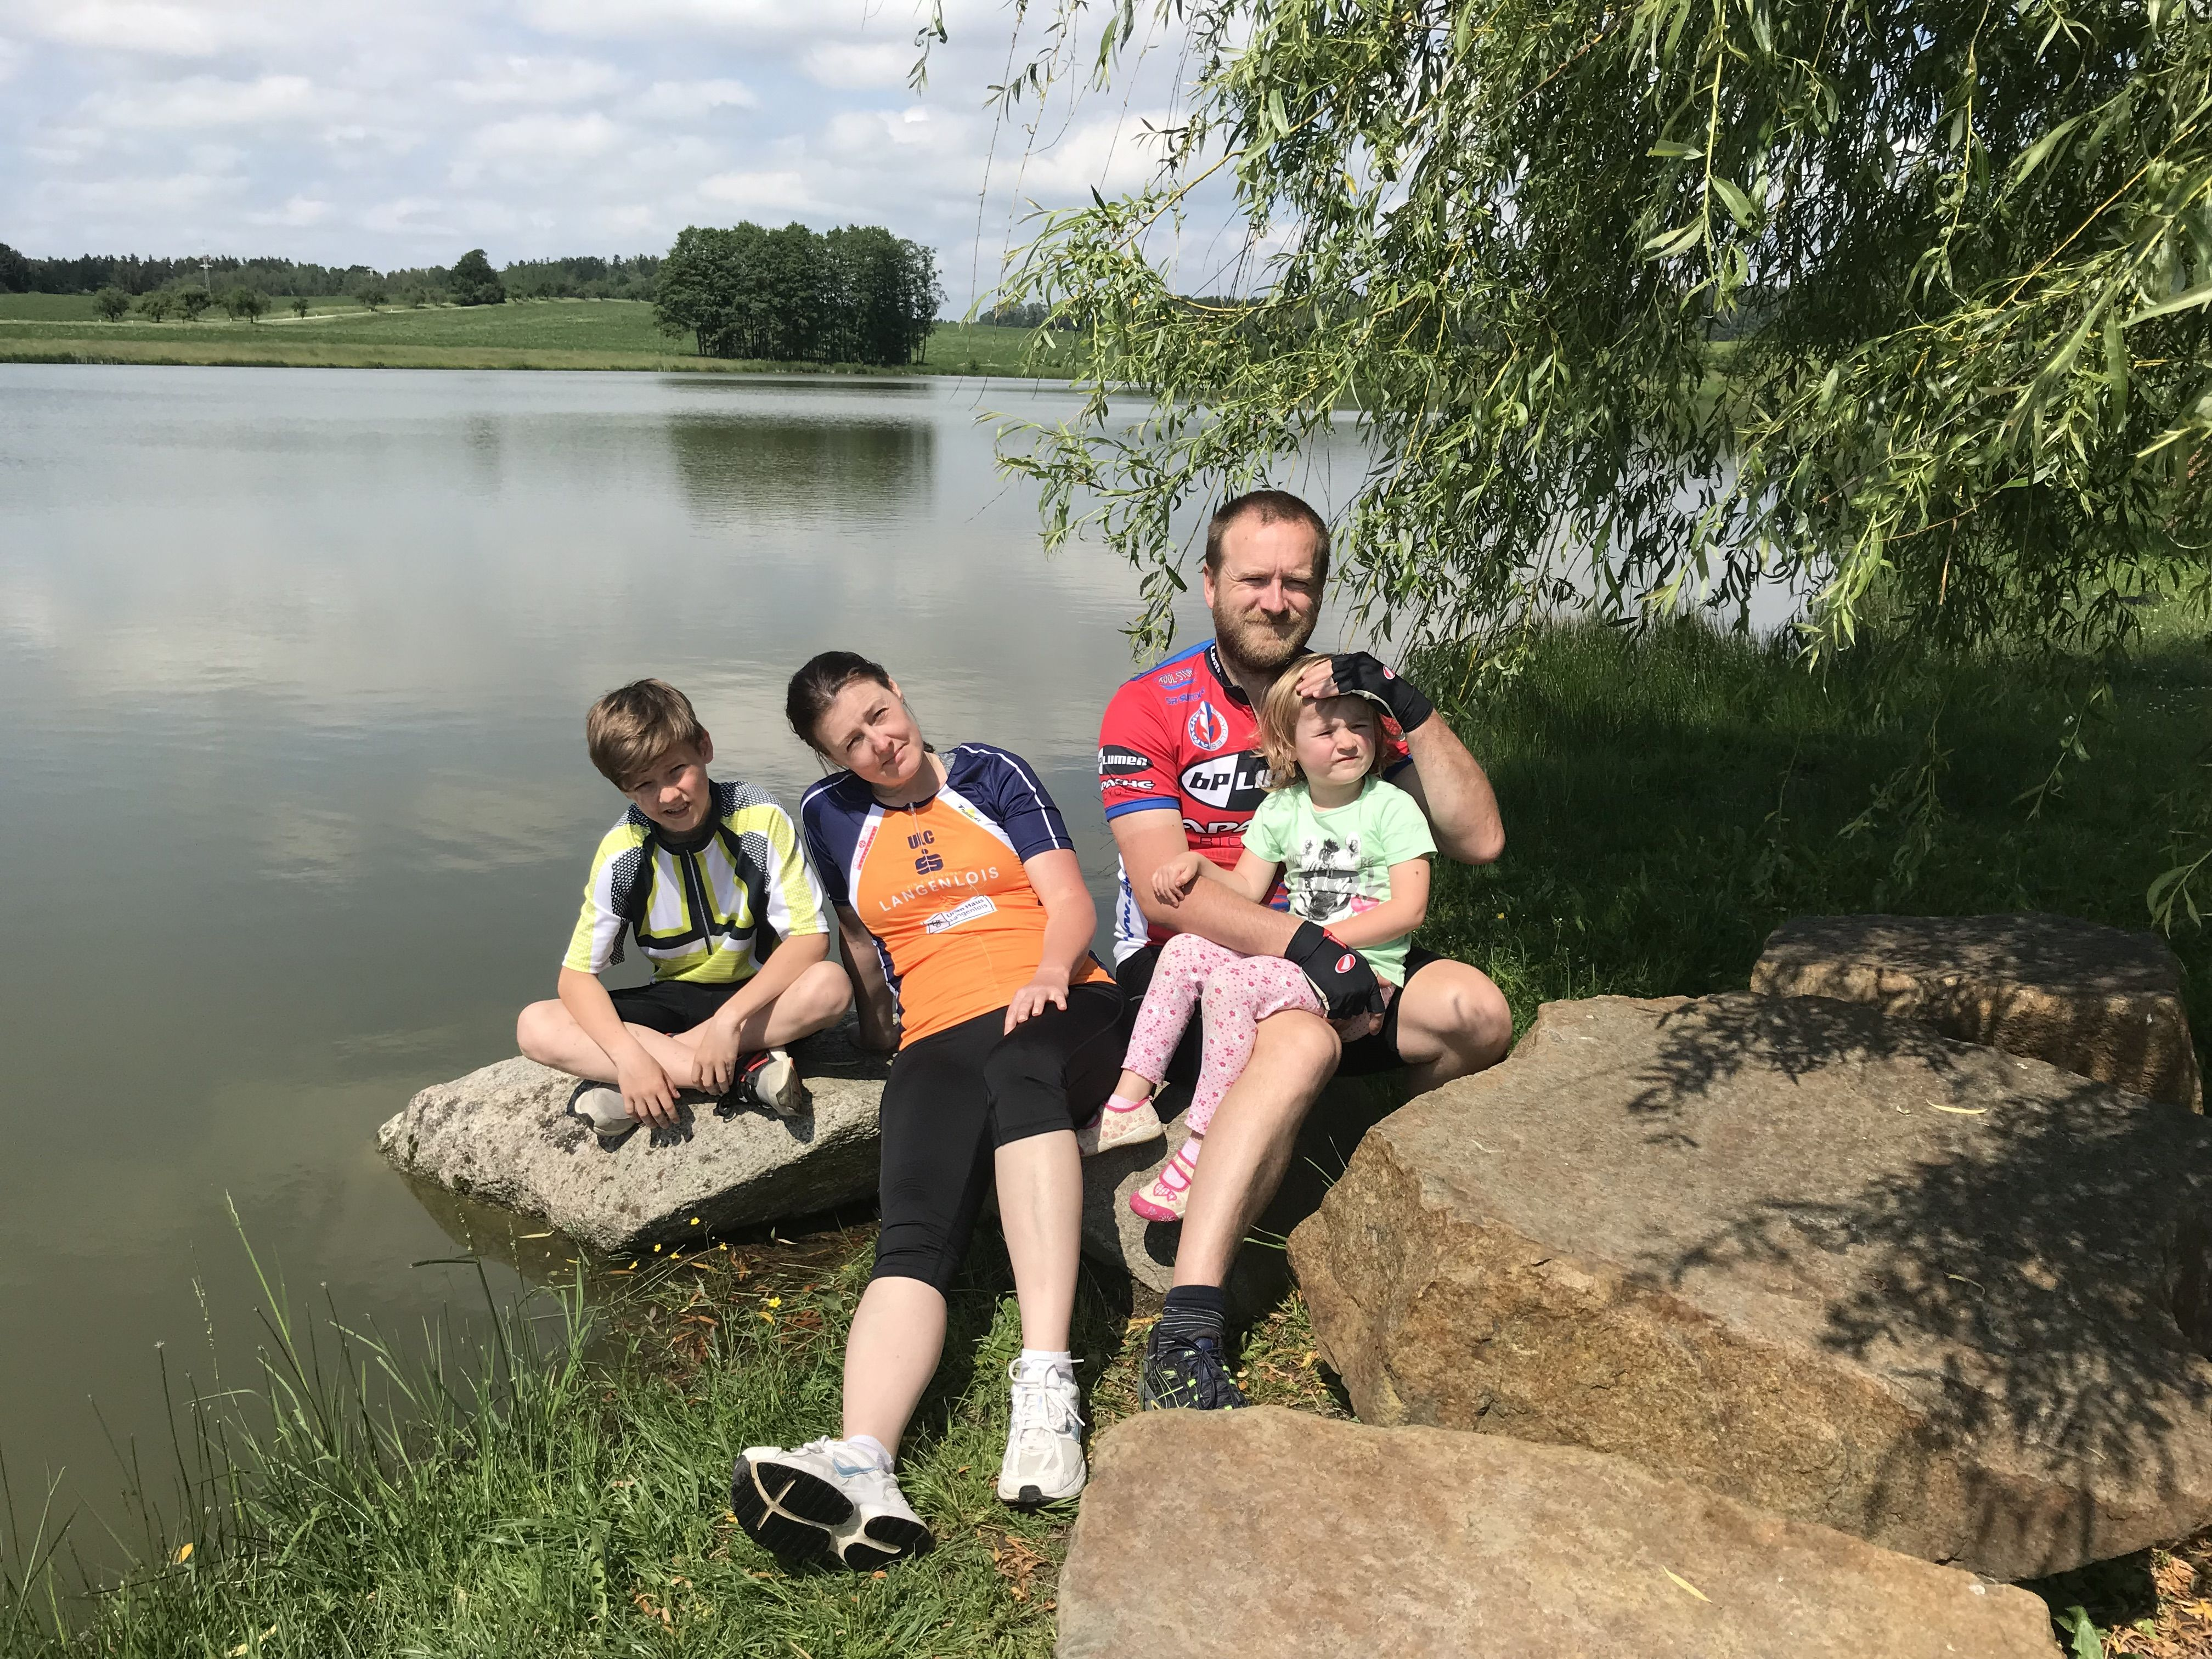 Rodinka u rybníka